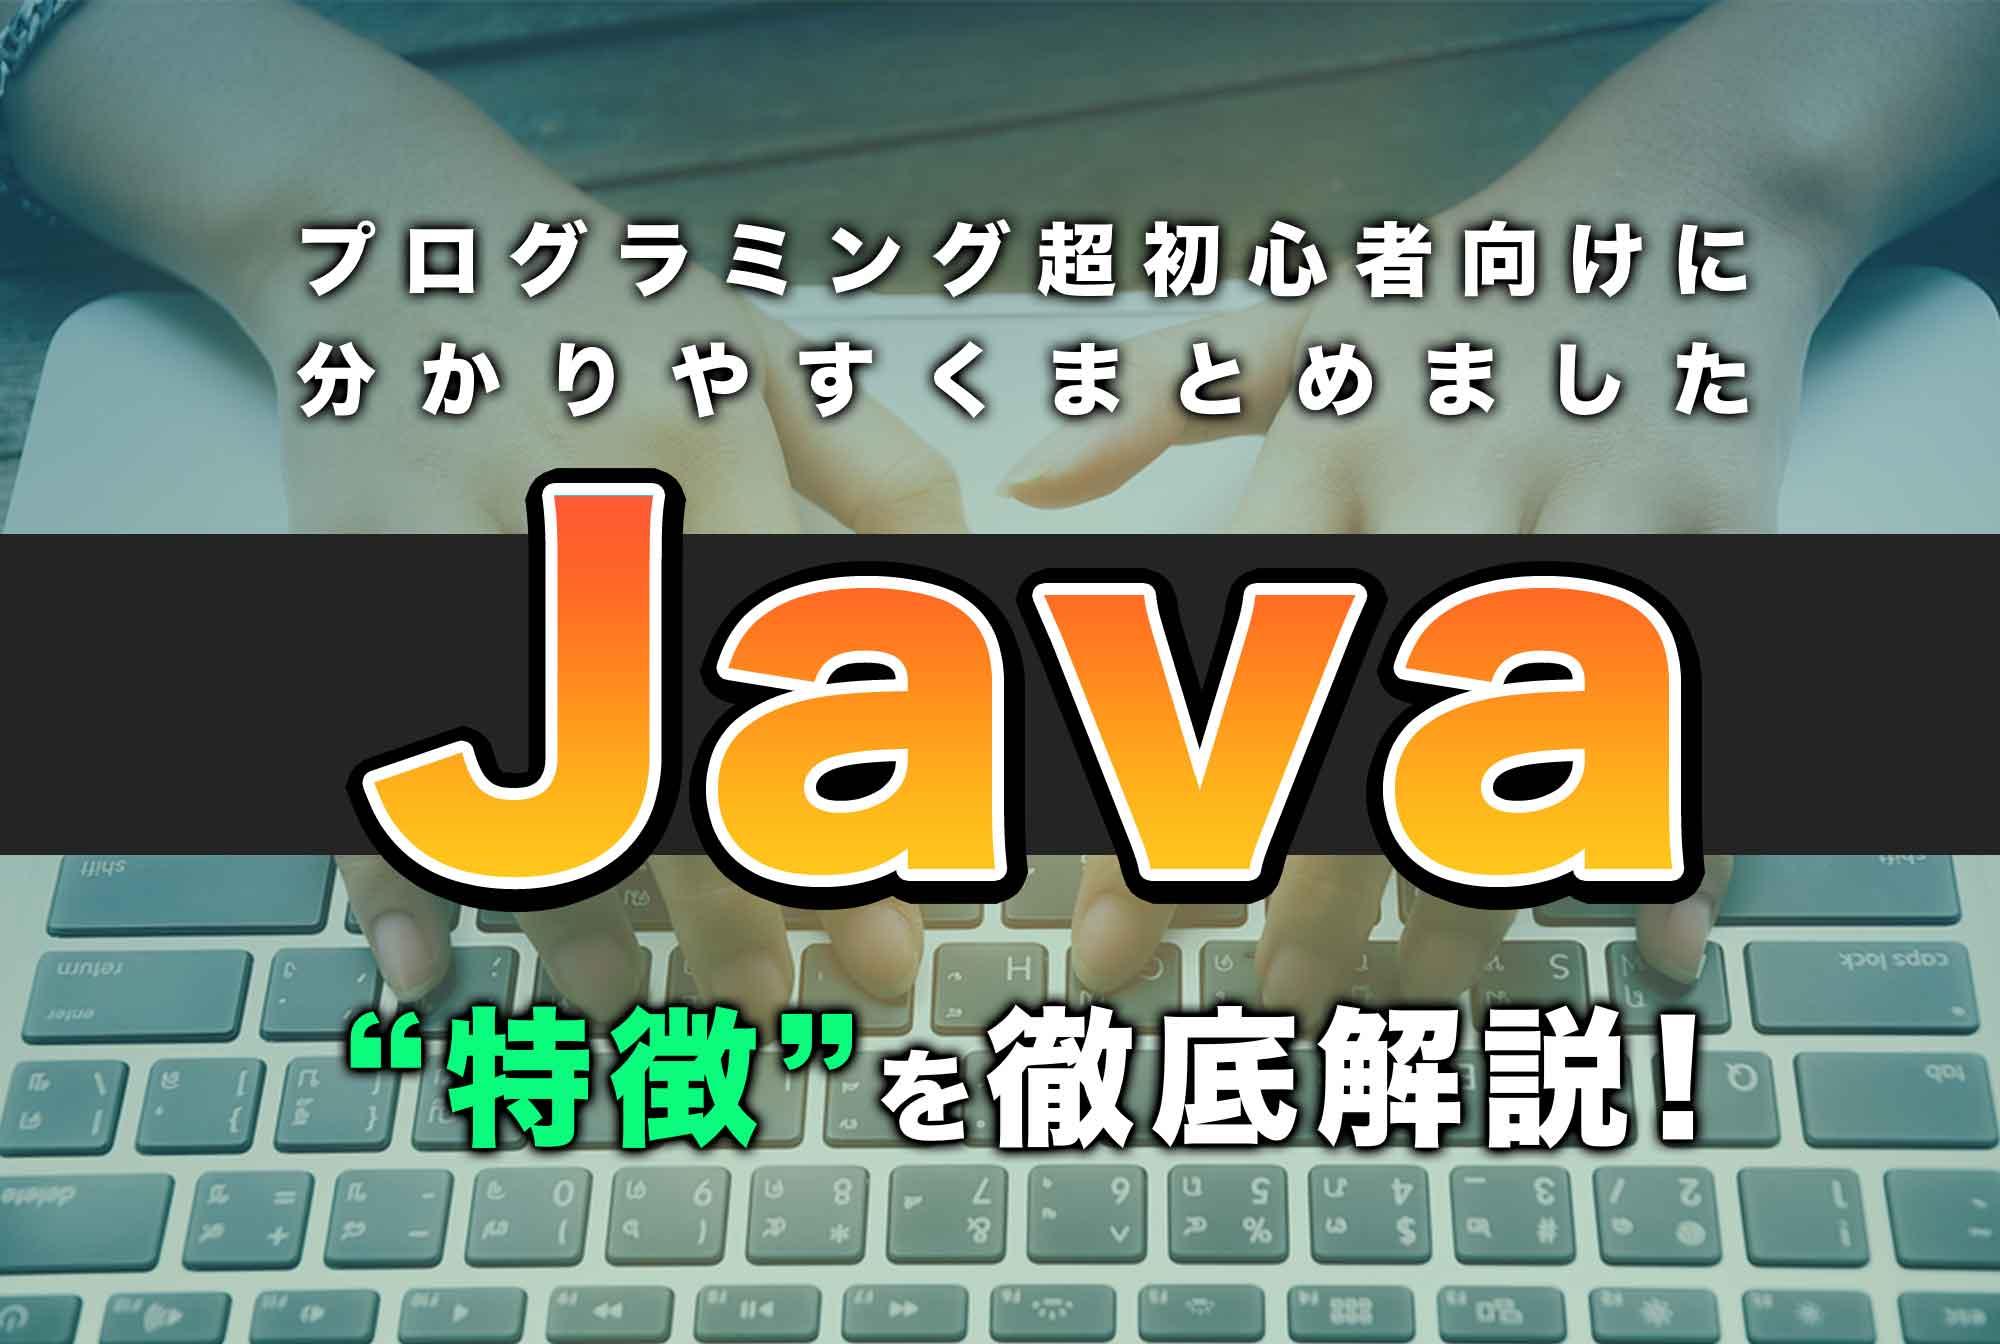 Javaの徹底解説プログラミング超初心者に向けて分かりやすくまとめました。